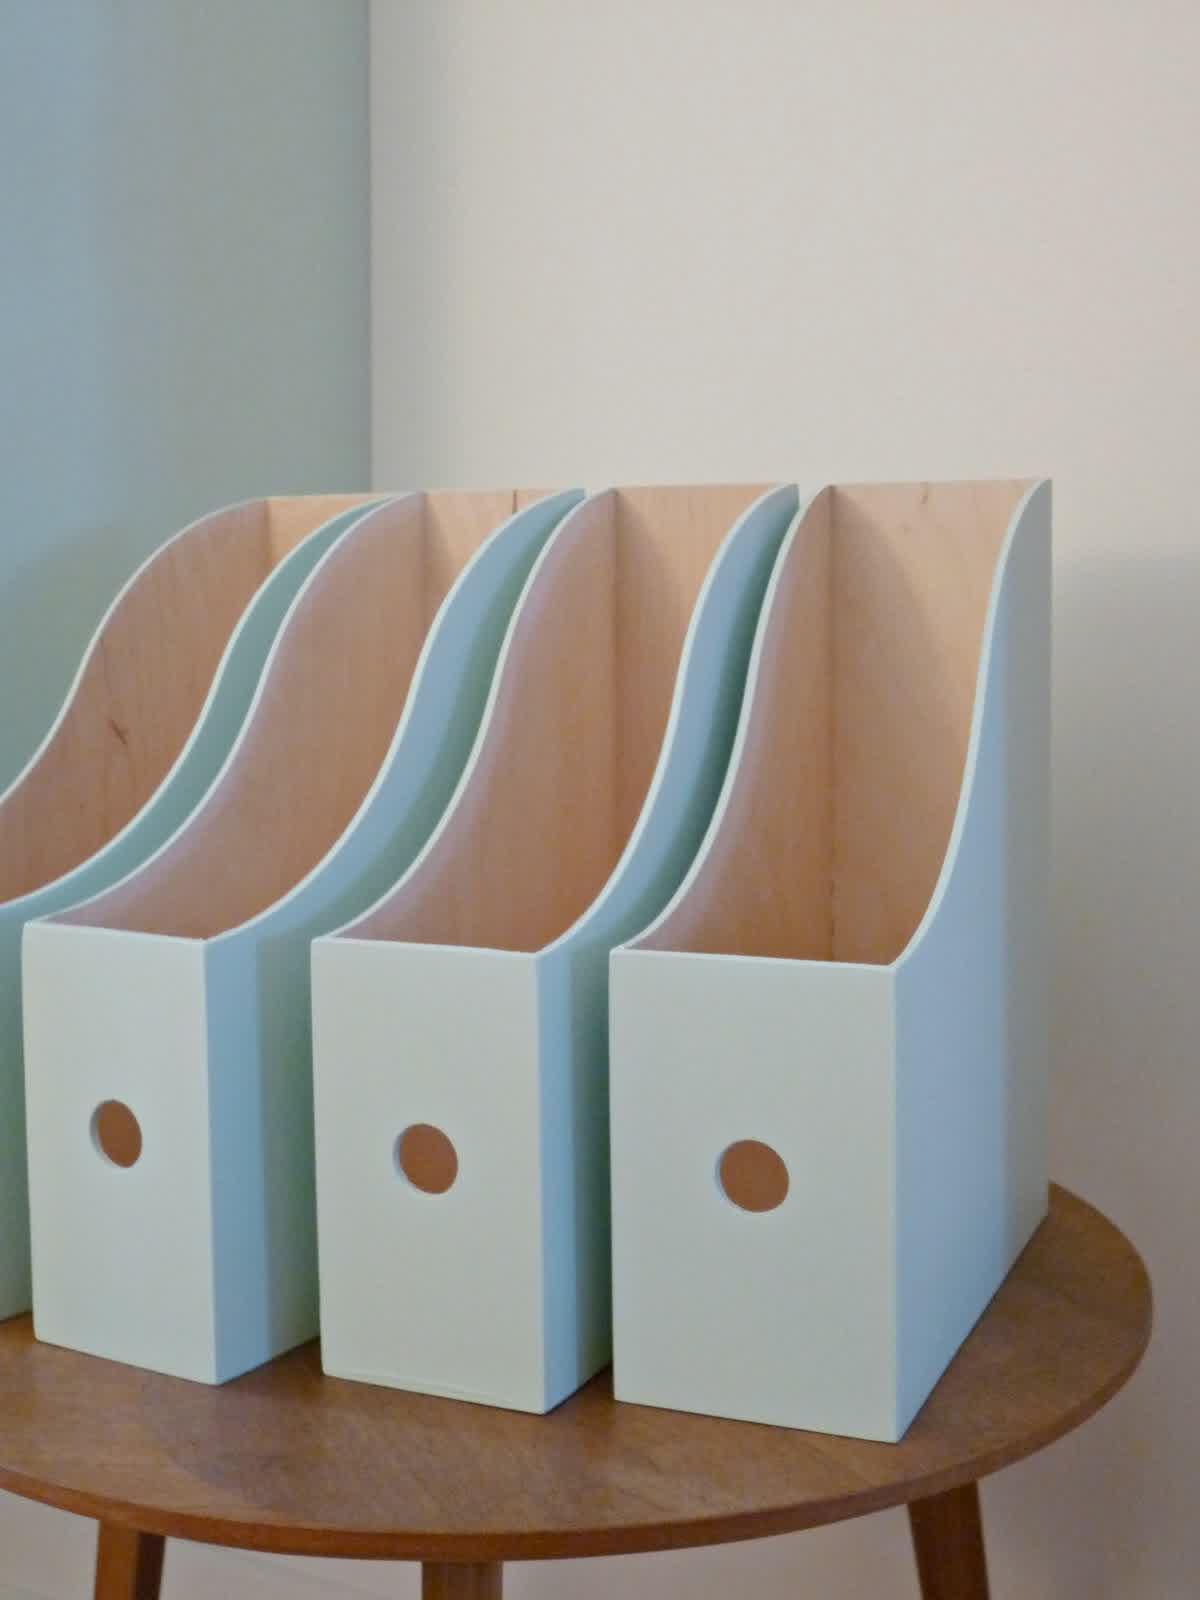 Uncategorized ikea magazine holders englishsurvivalkit for Ikea picture holder